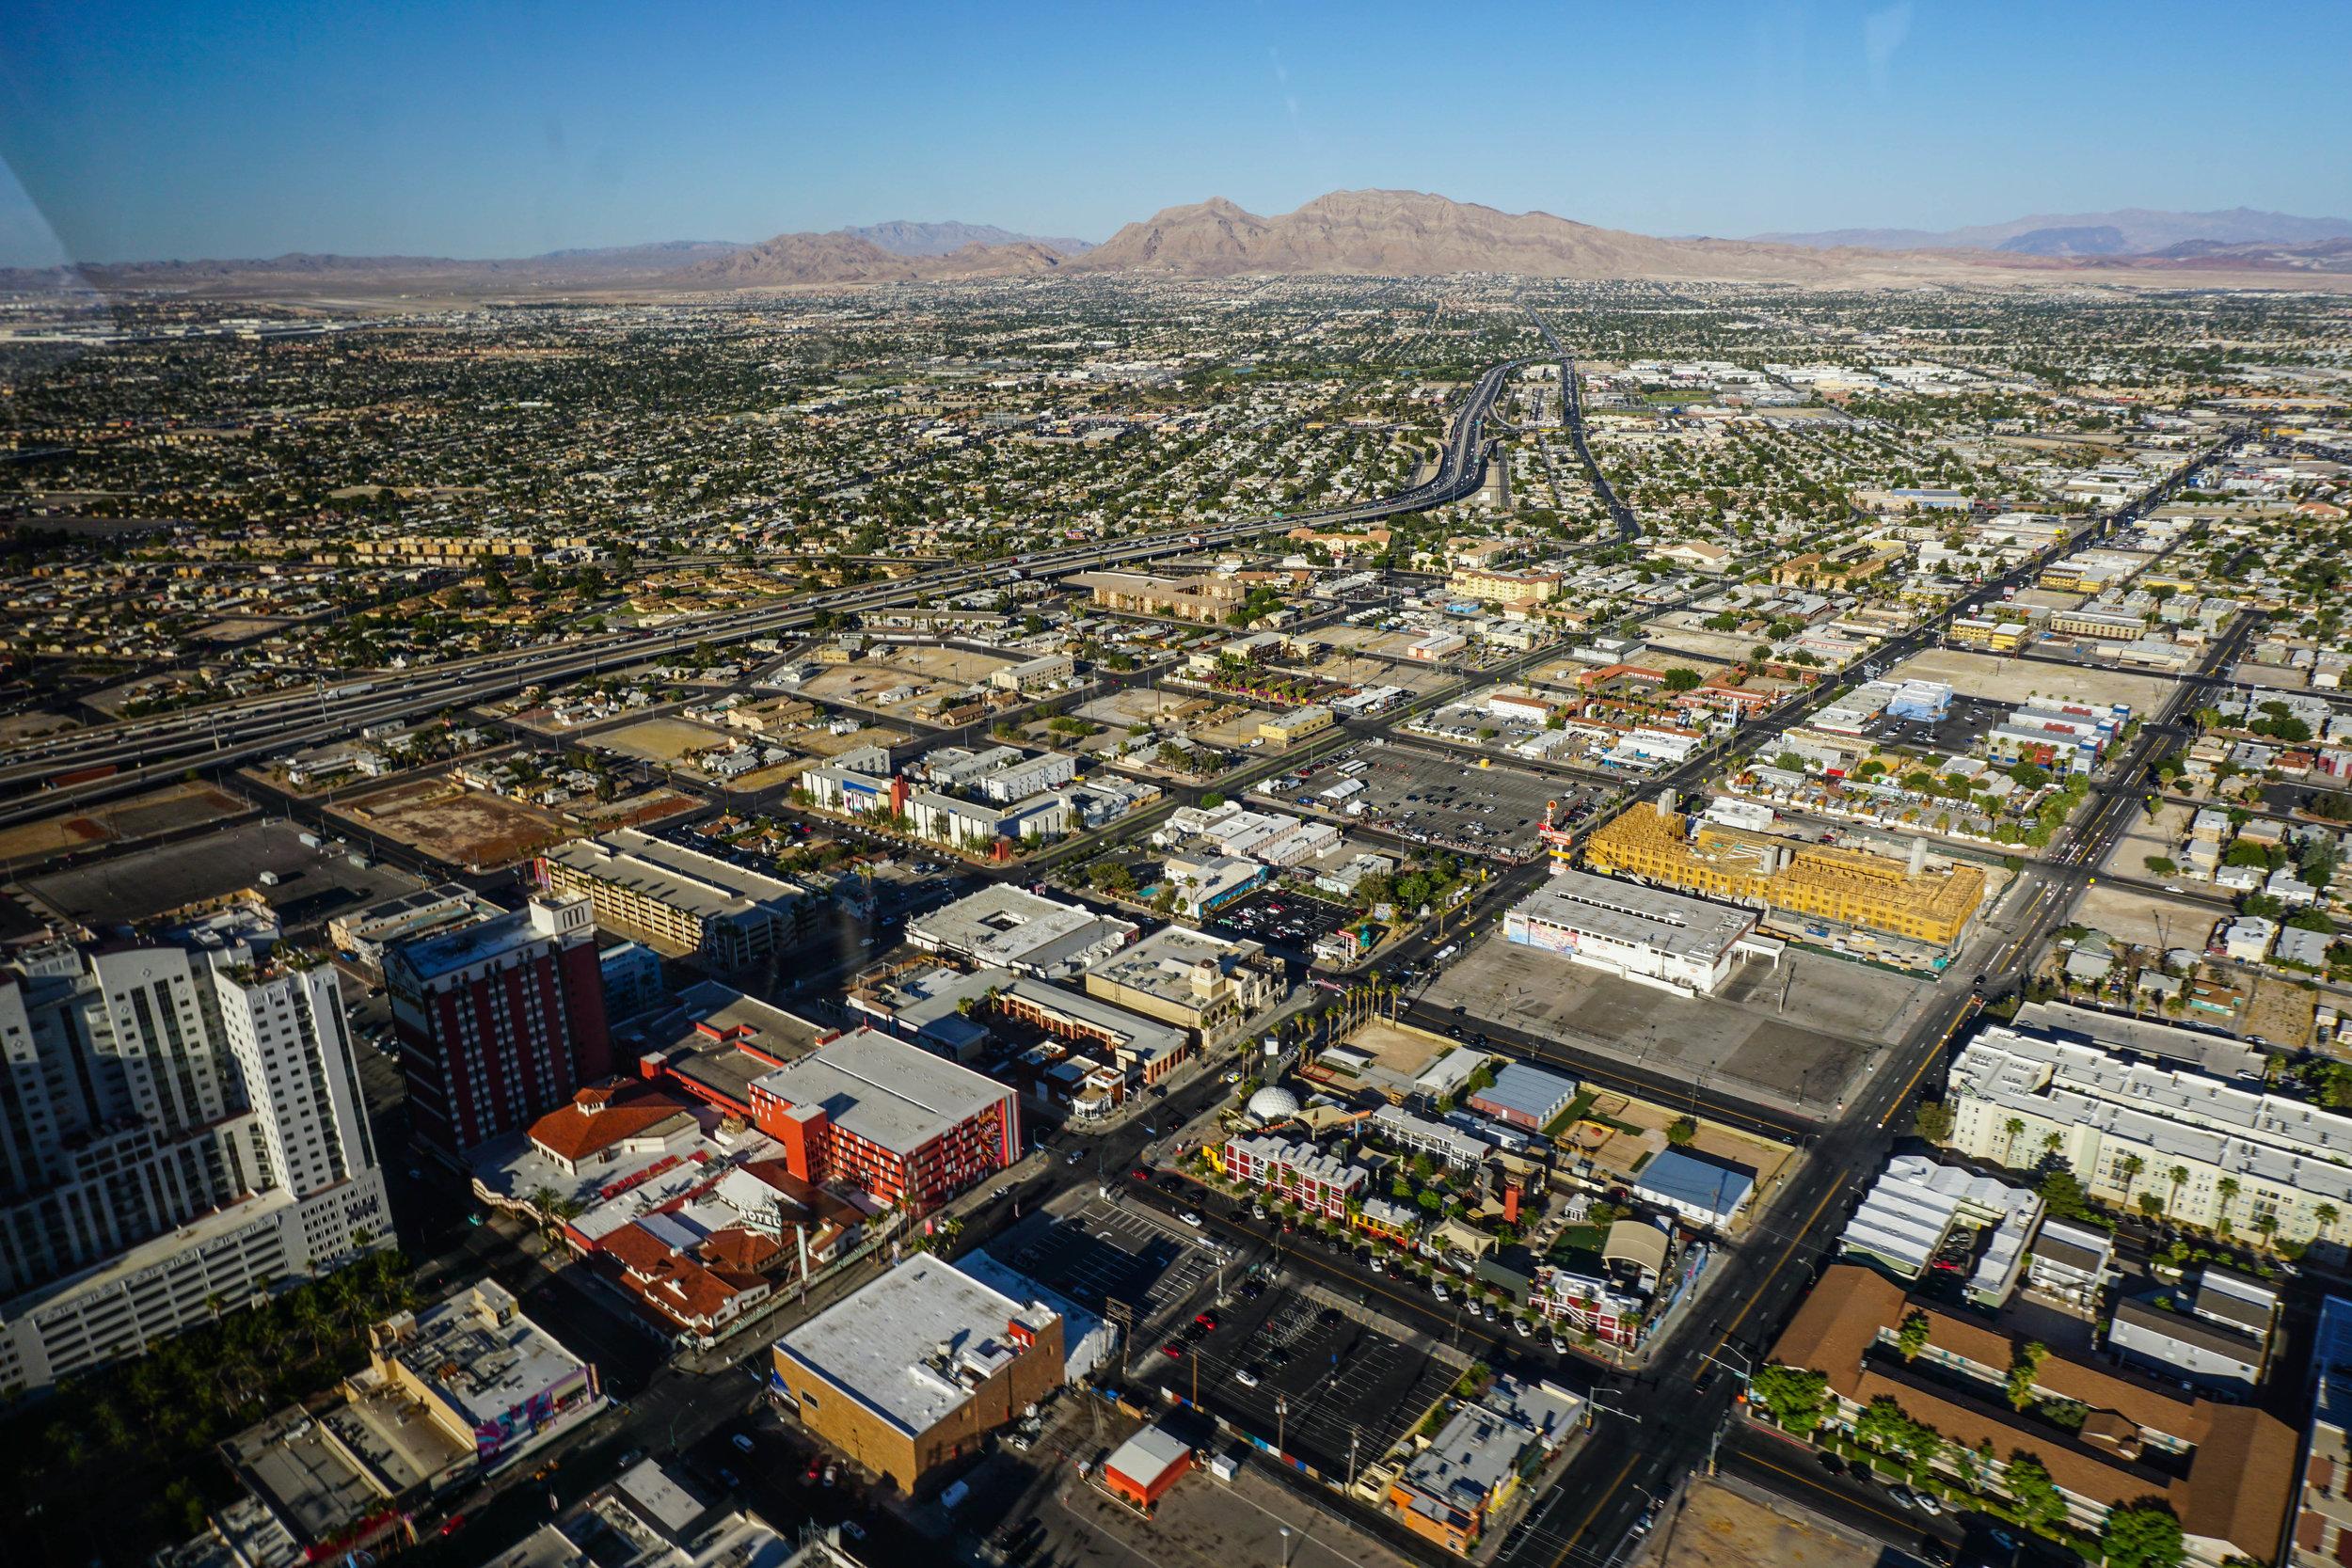 View of vegas suburbs